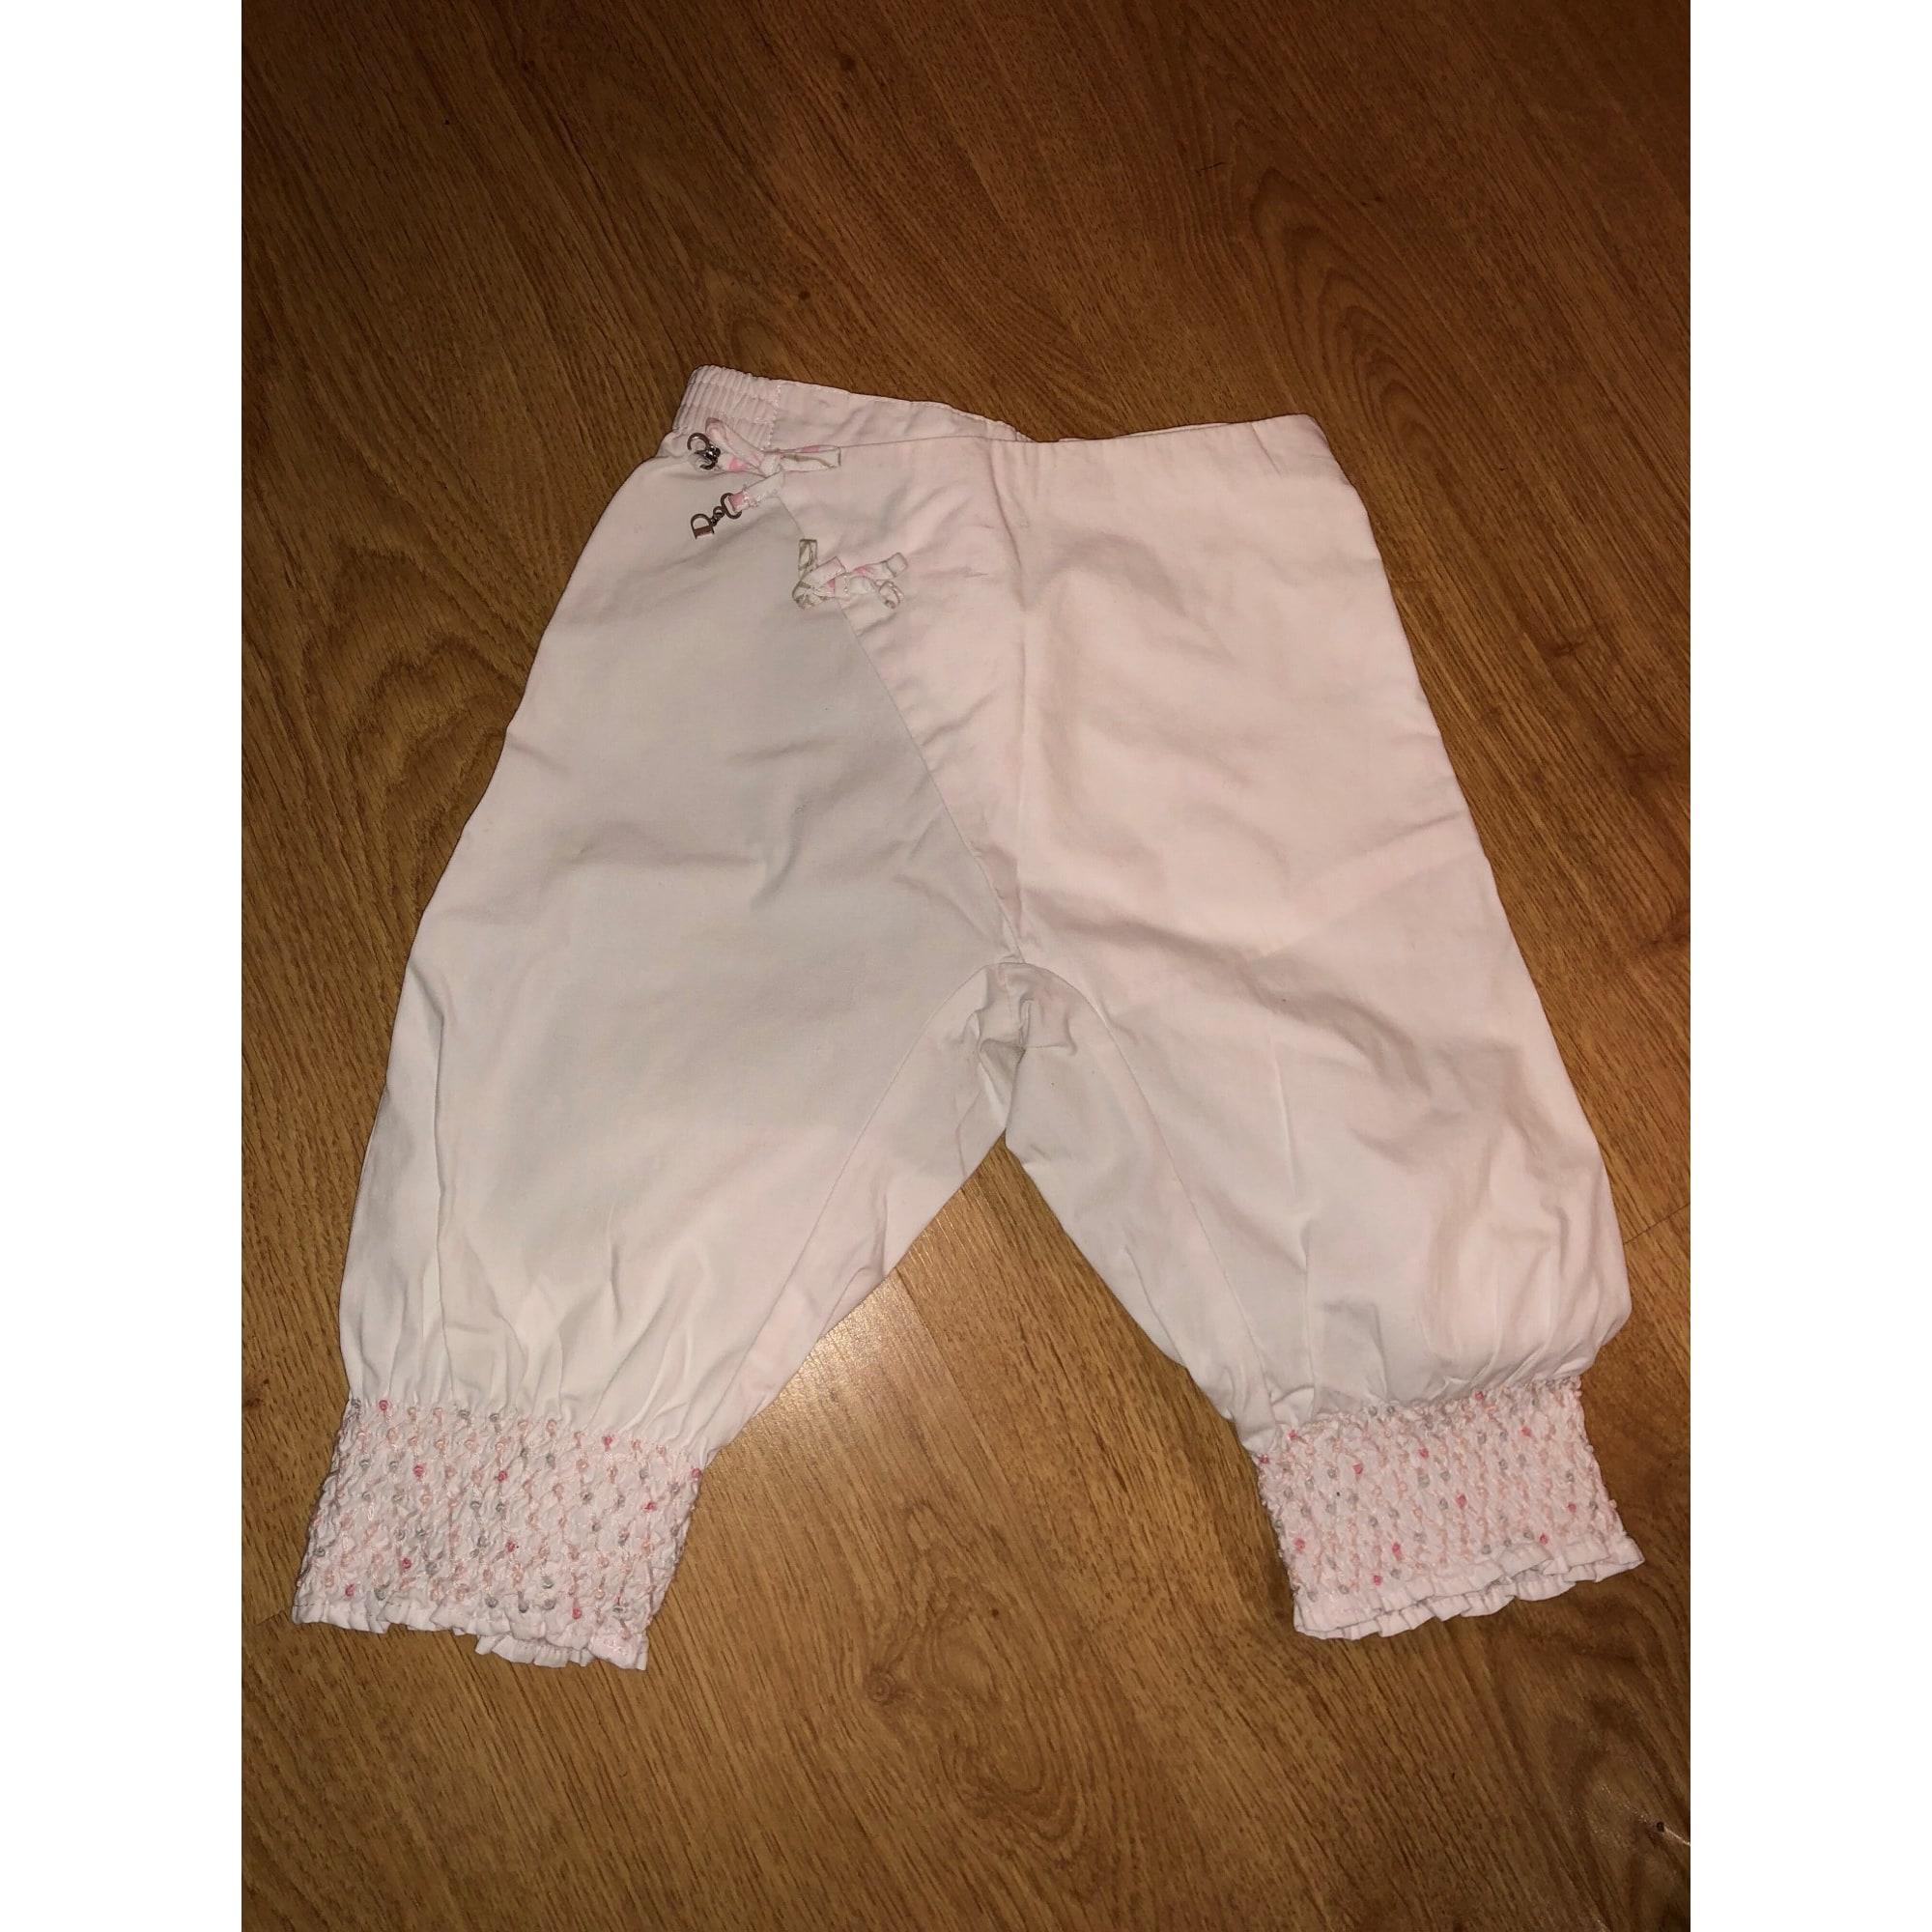 Pantalon BABY DIOR Blanc, blanc cassé, écru